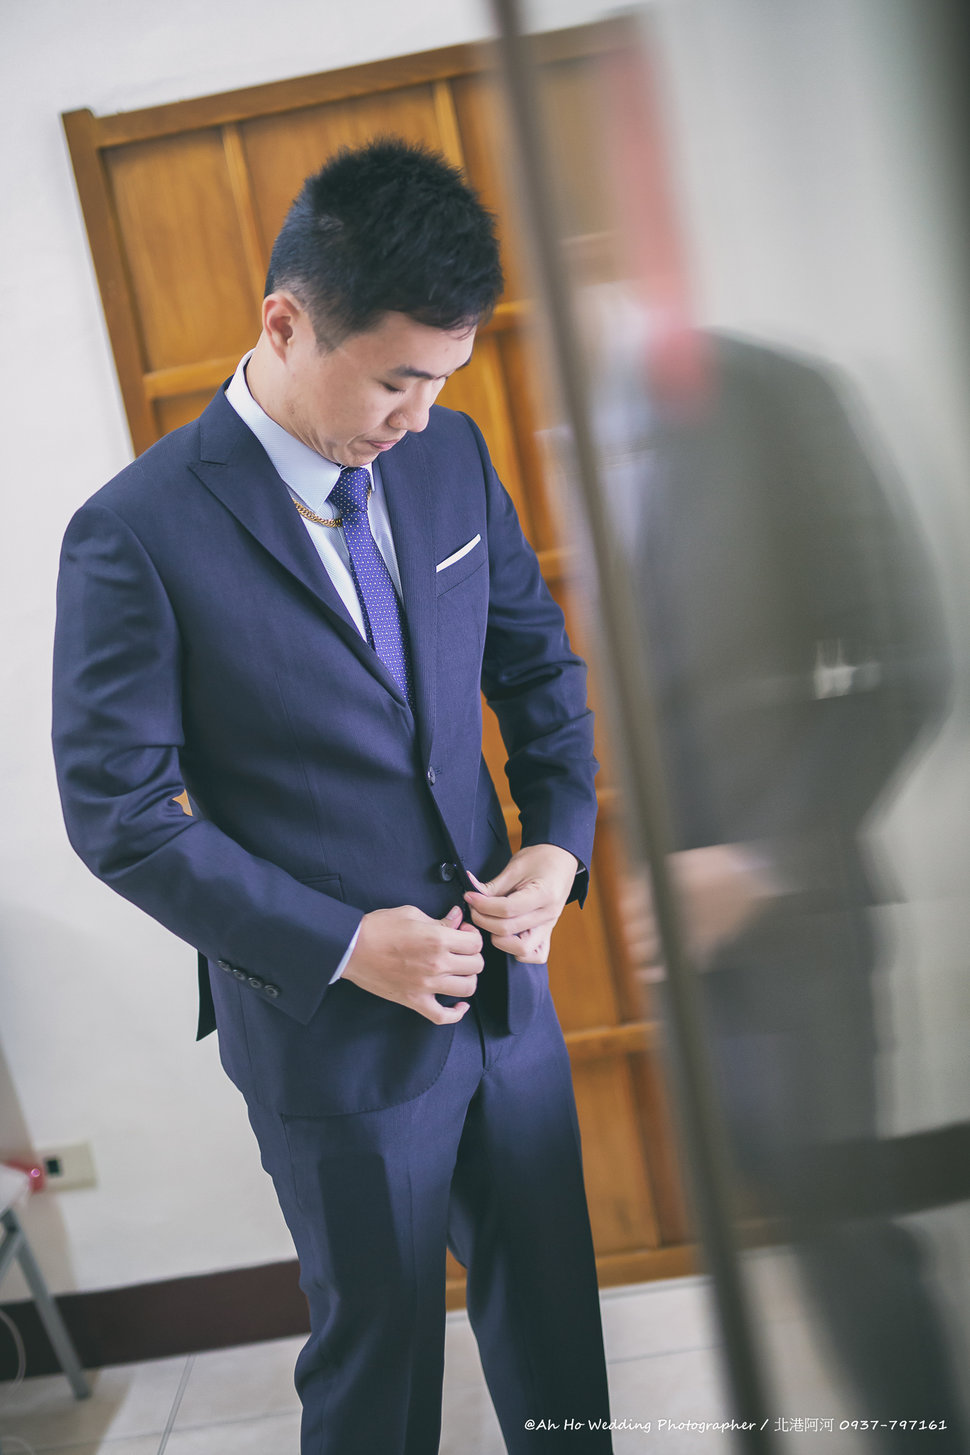 AhHo Wedding TEL-0937797161 lineID-chiupeiho-11 - 北港阿河婚攝 AhHoWedding - 結婚吧